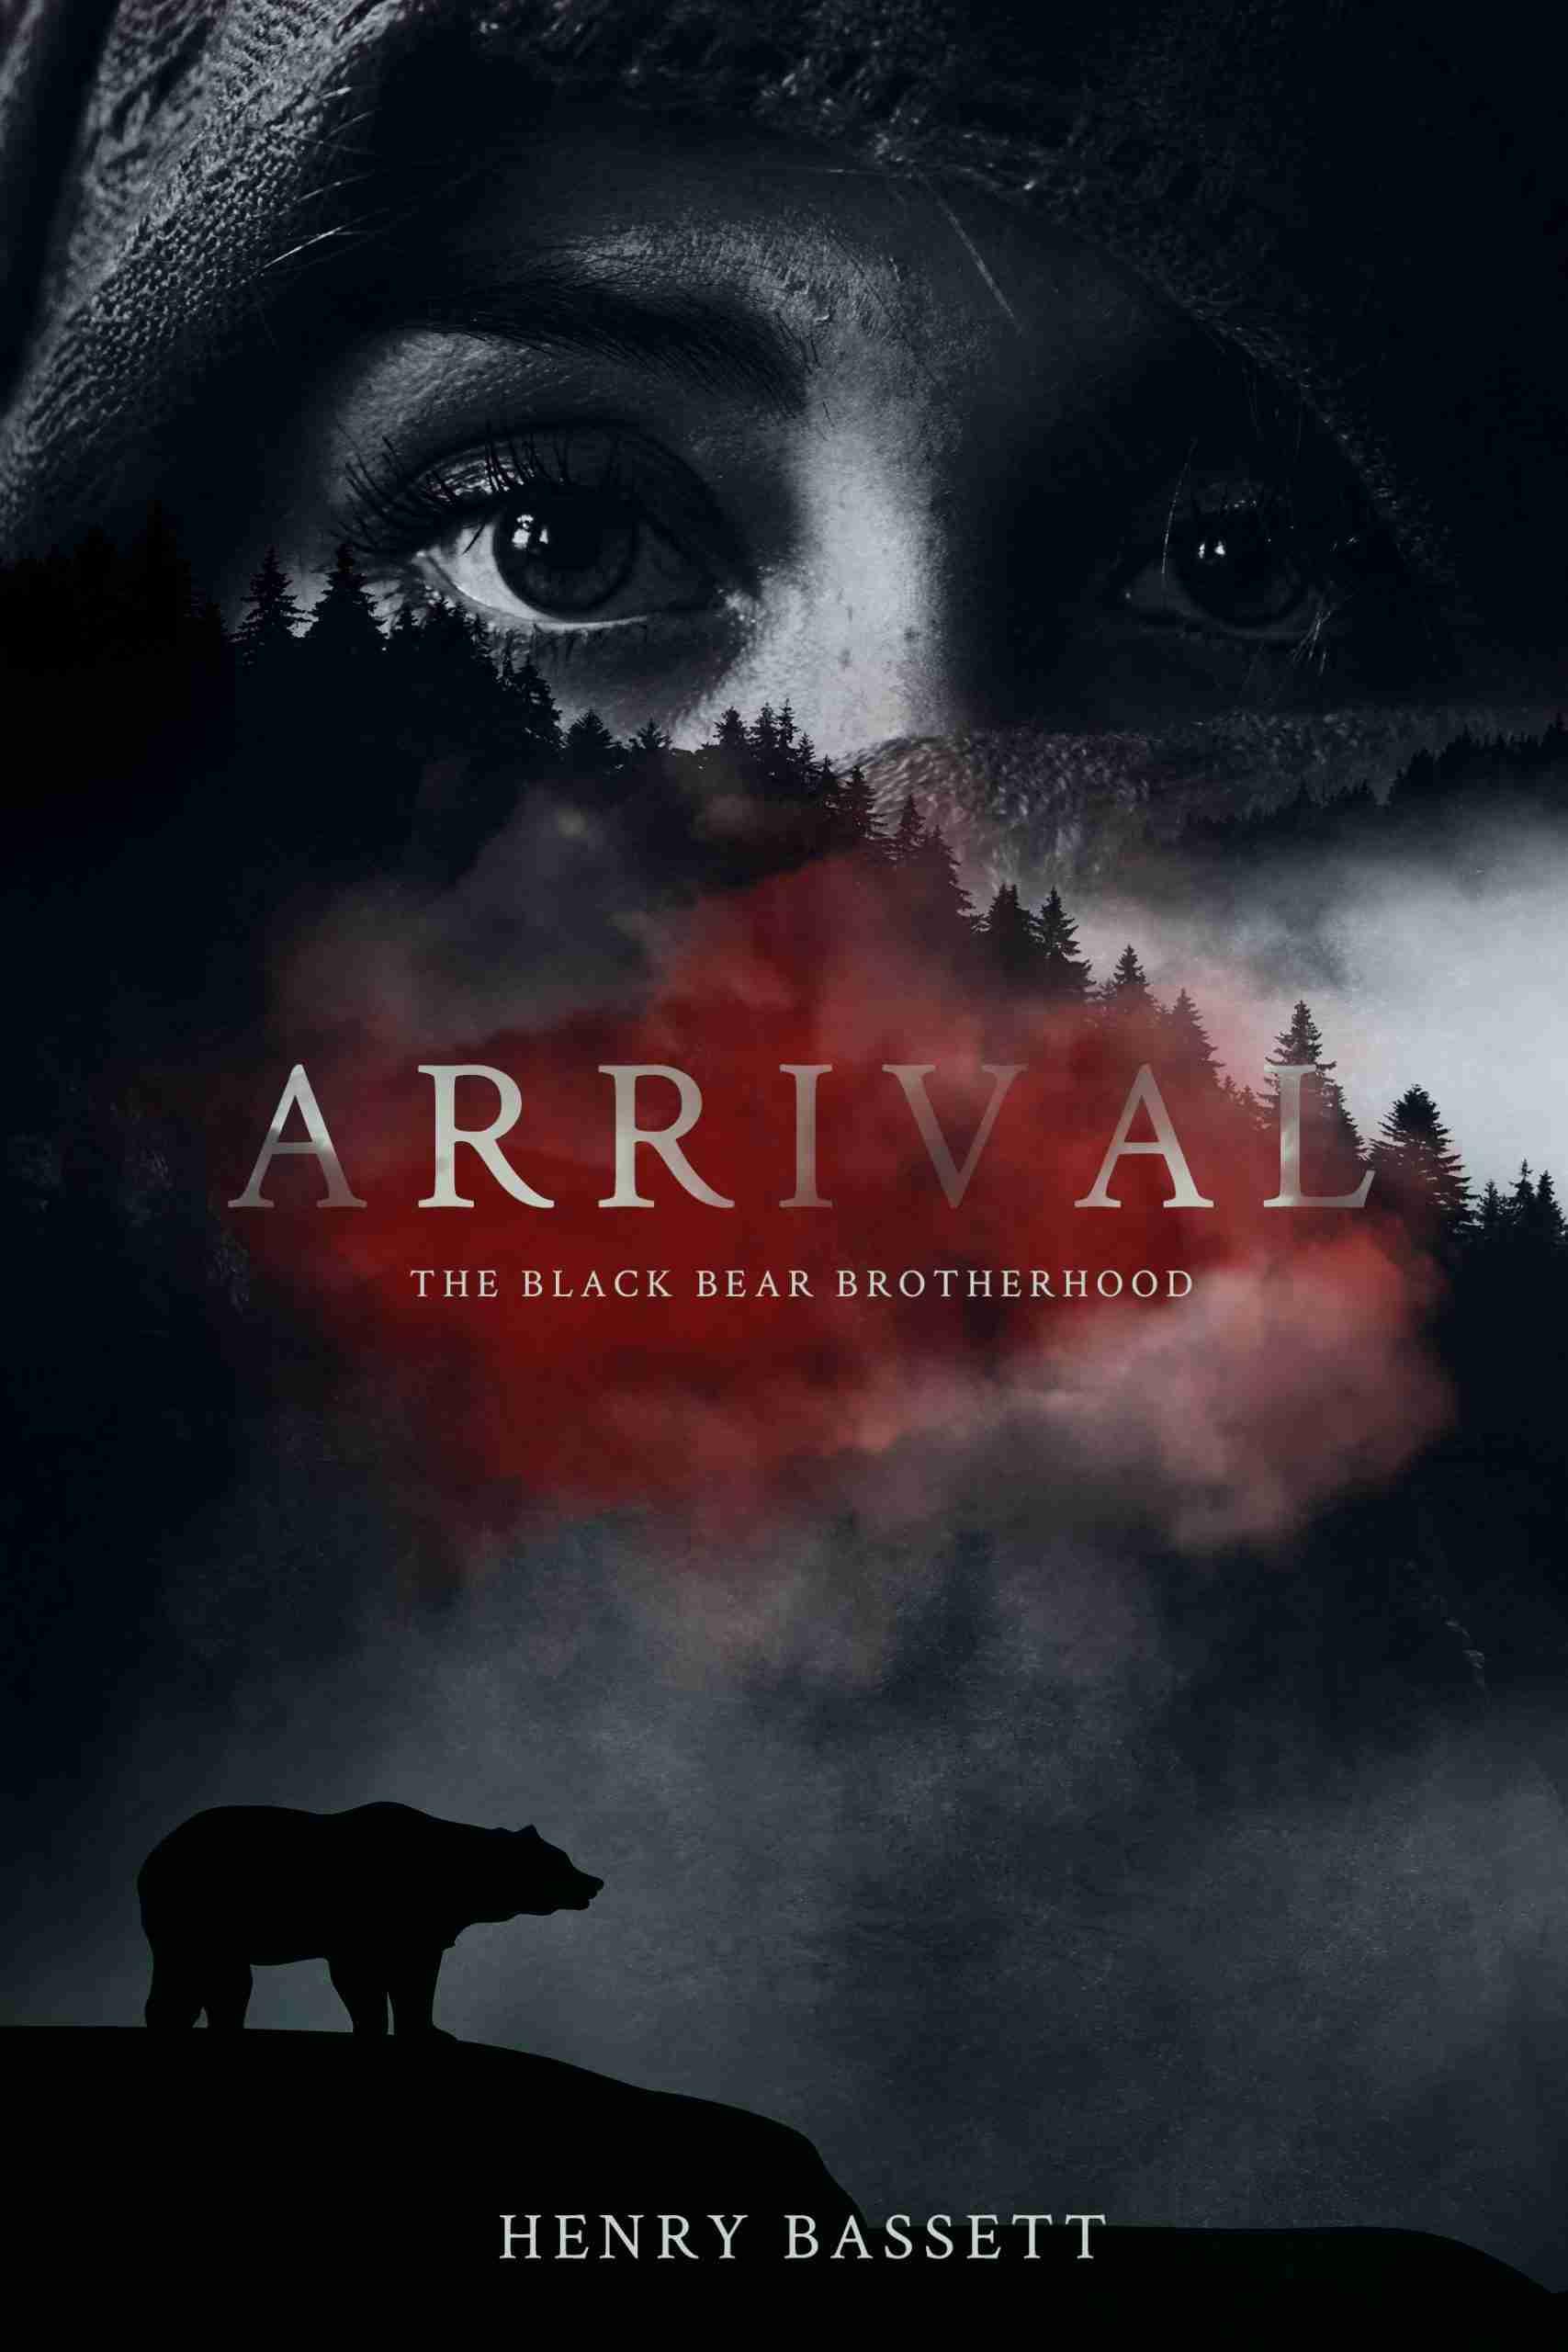 Arrival: The Black Bear Brotherhood, by Henry Bassett